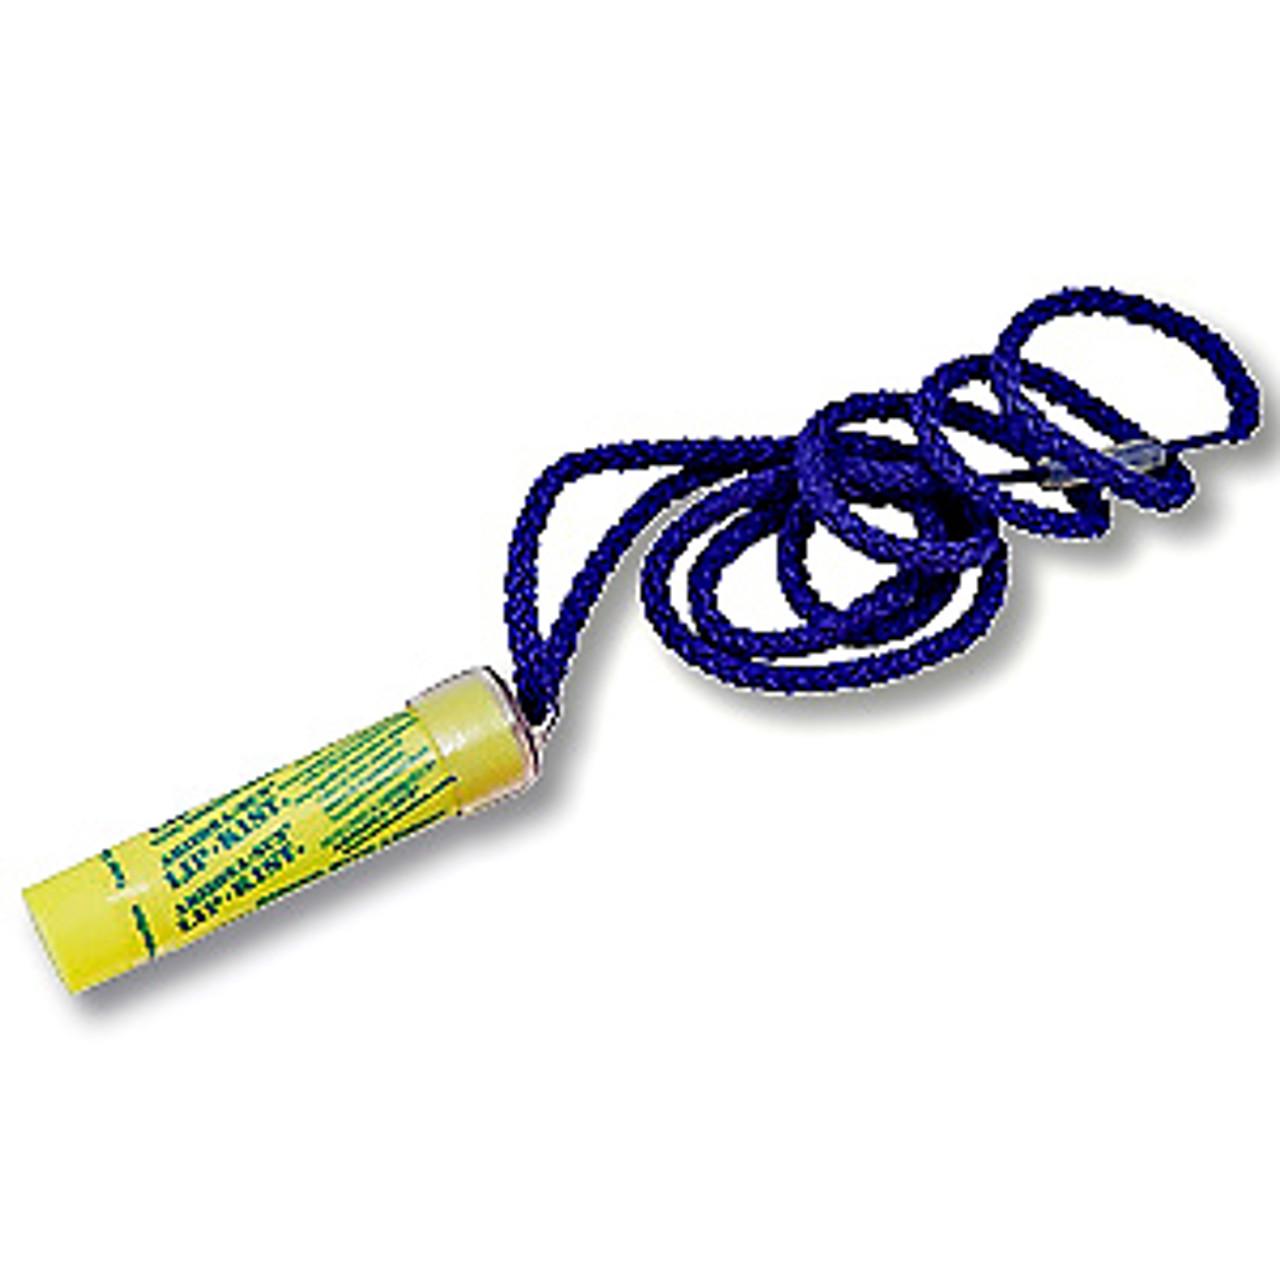 LipKist SPF15 On A Rope- .15oz